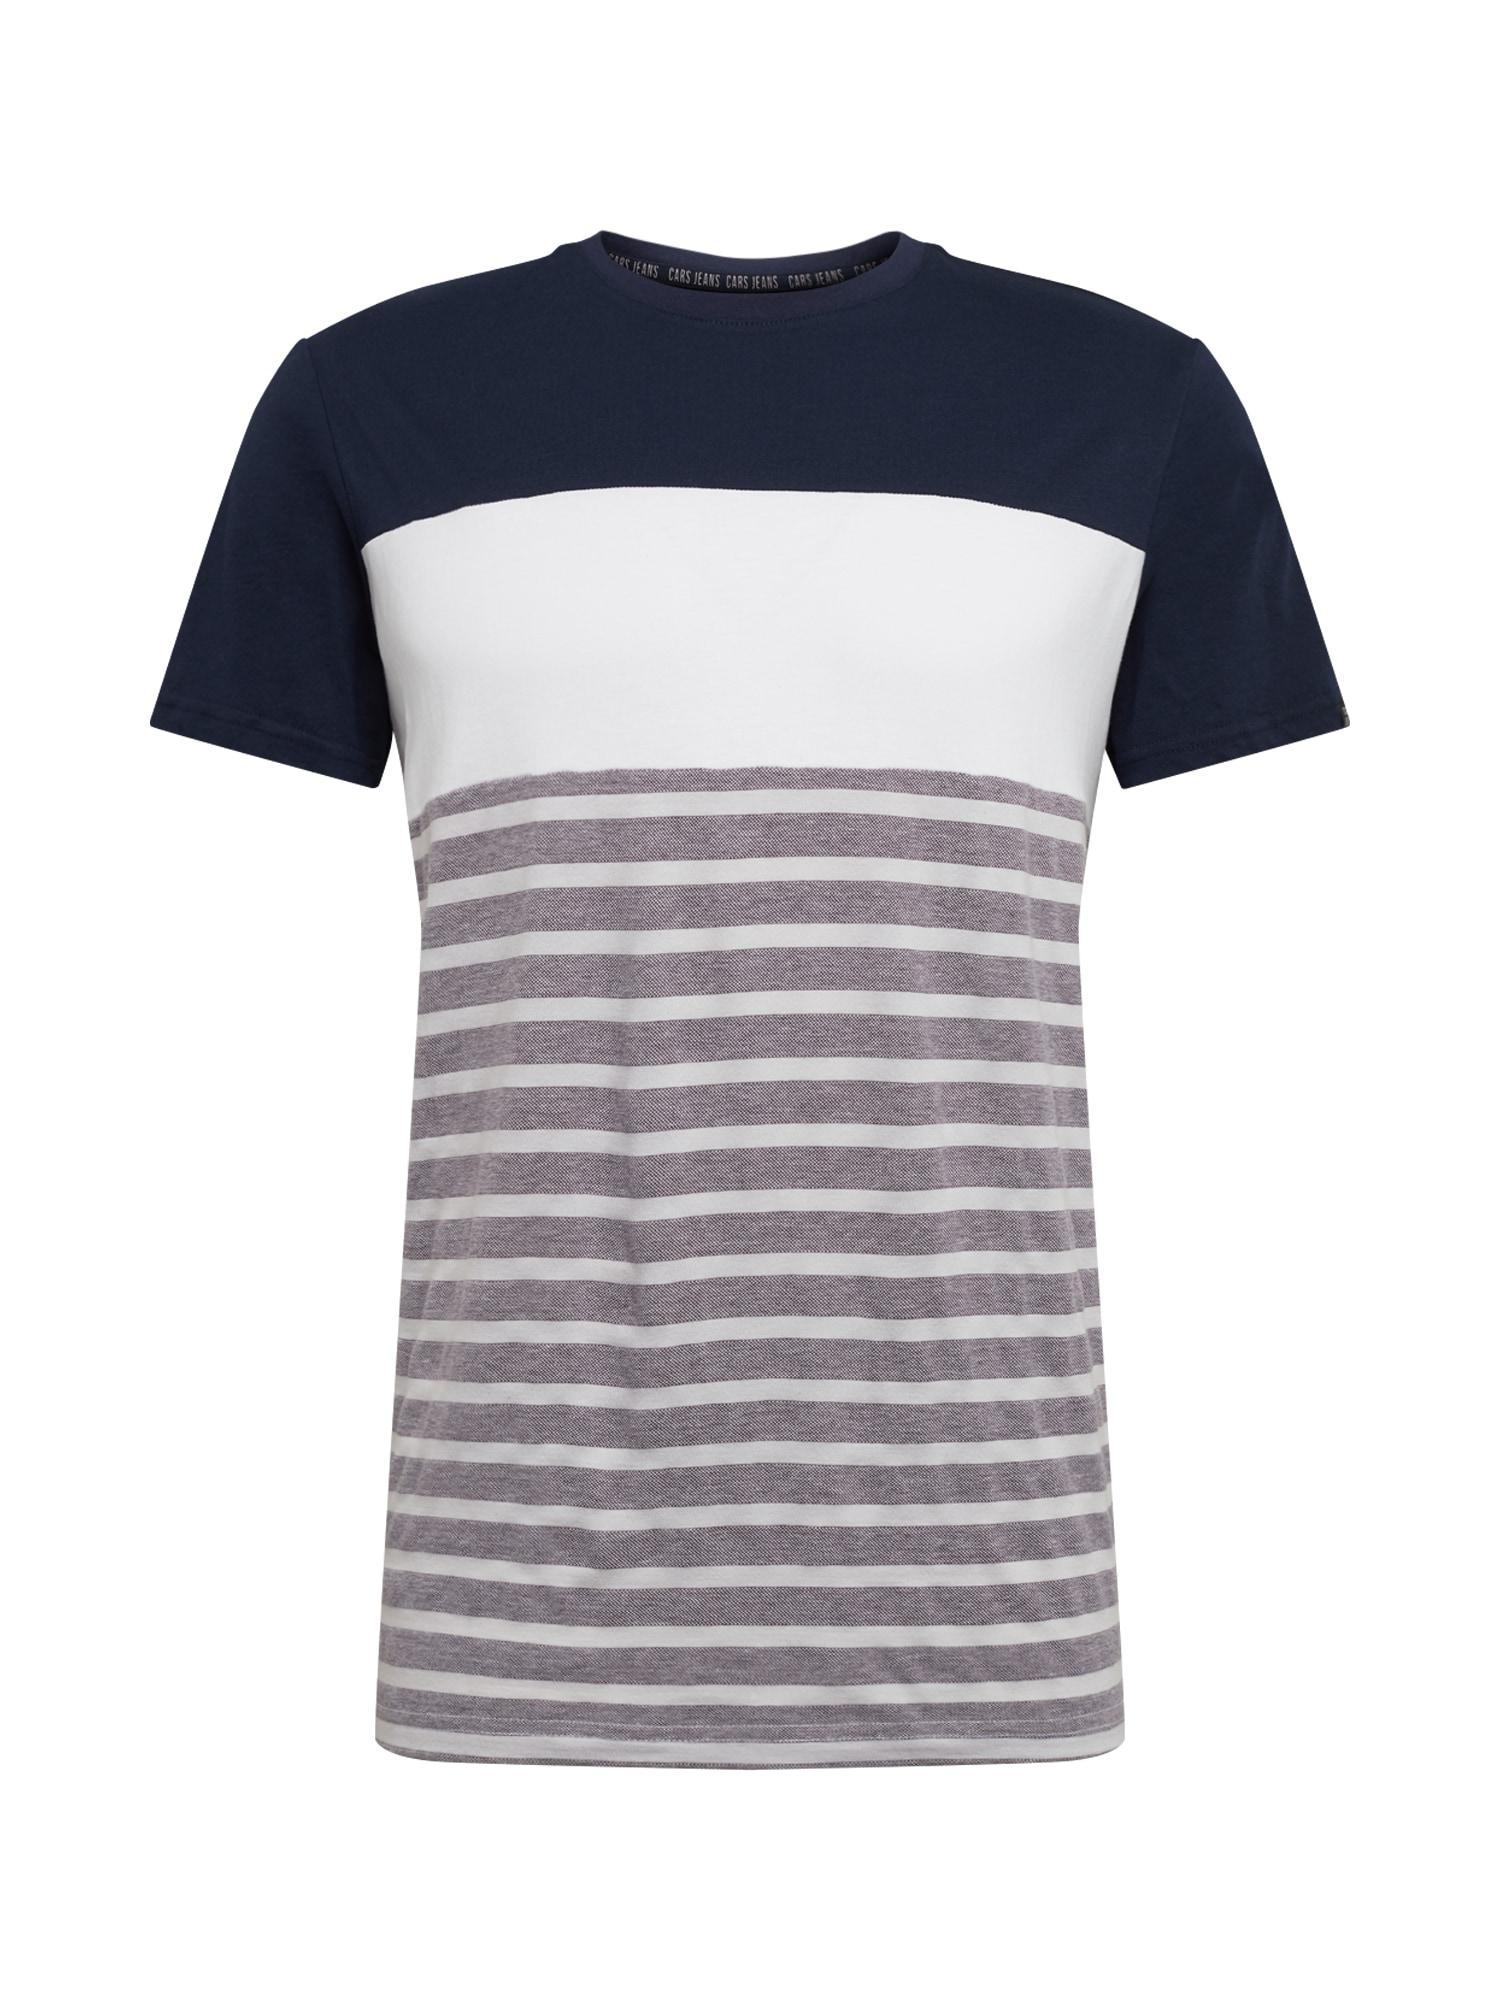 Cars Jeans Marškinėliai 'LETON TS' balta / tamsiai mėlyna